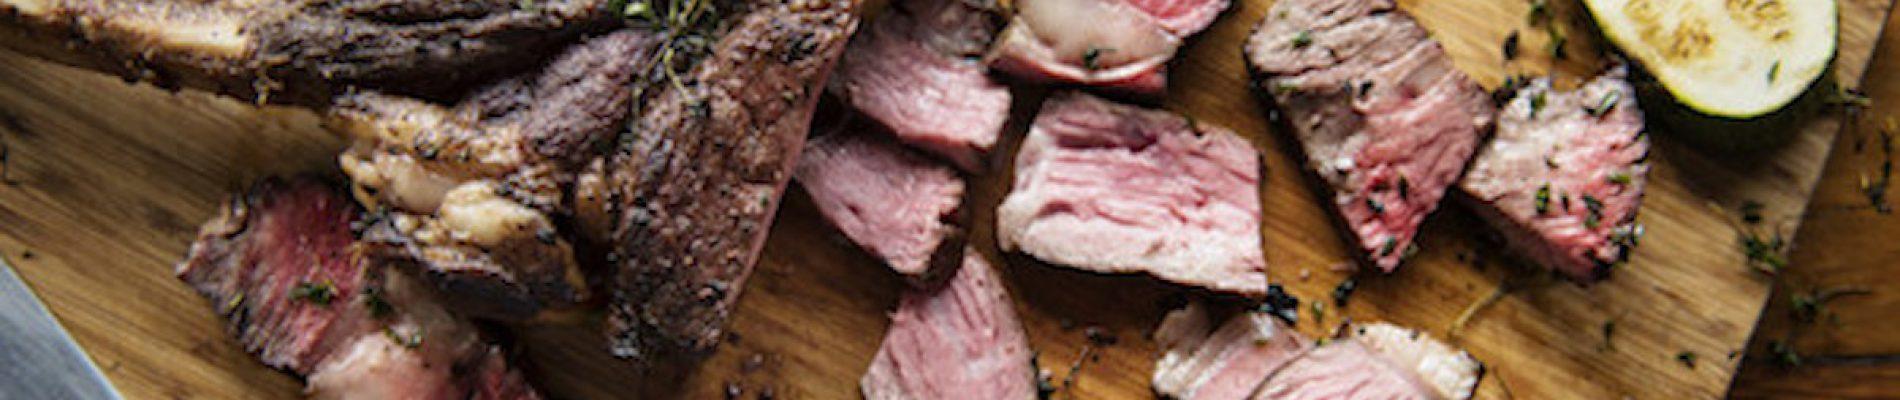 Cutted Beef Steak Cuisine Concept